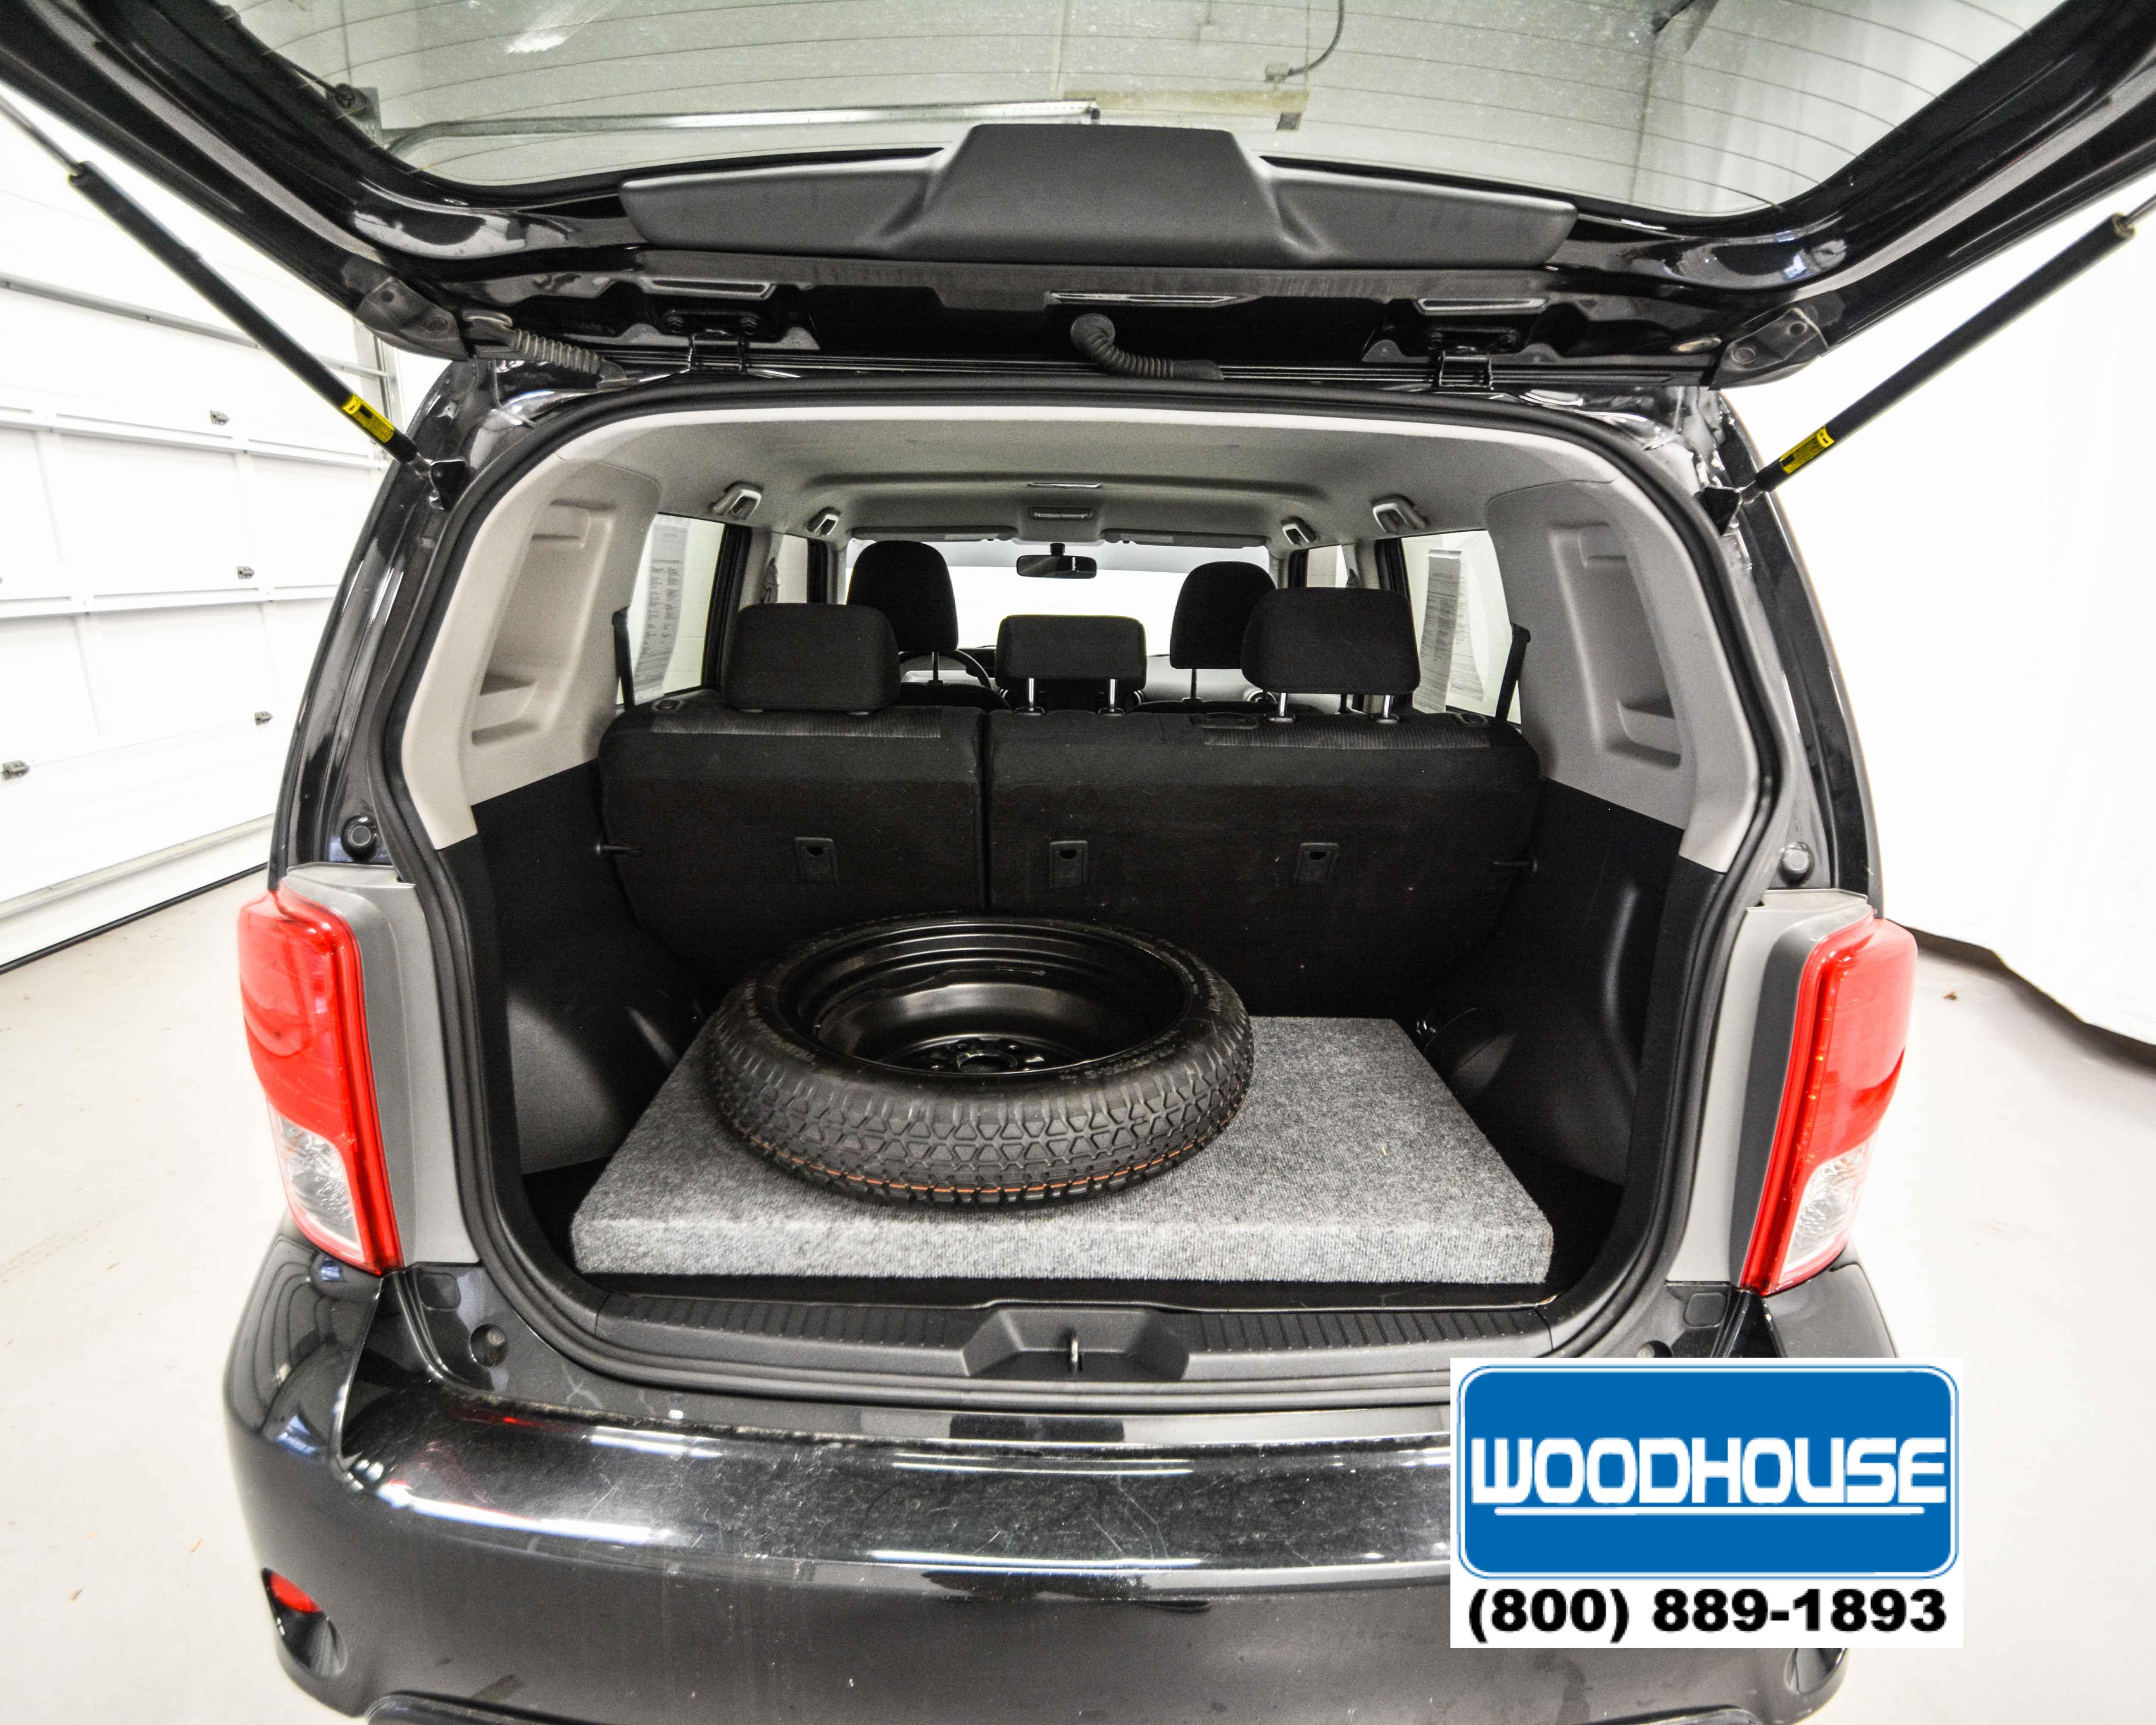 Woodhouse Hail Damage >> Scion of Omaha | Woodhouse Auto